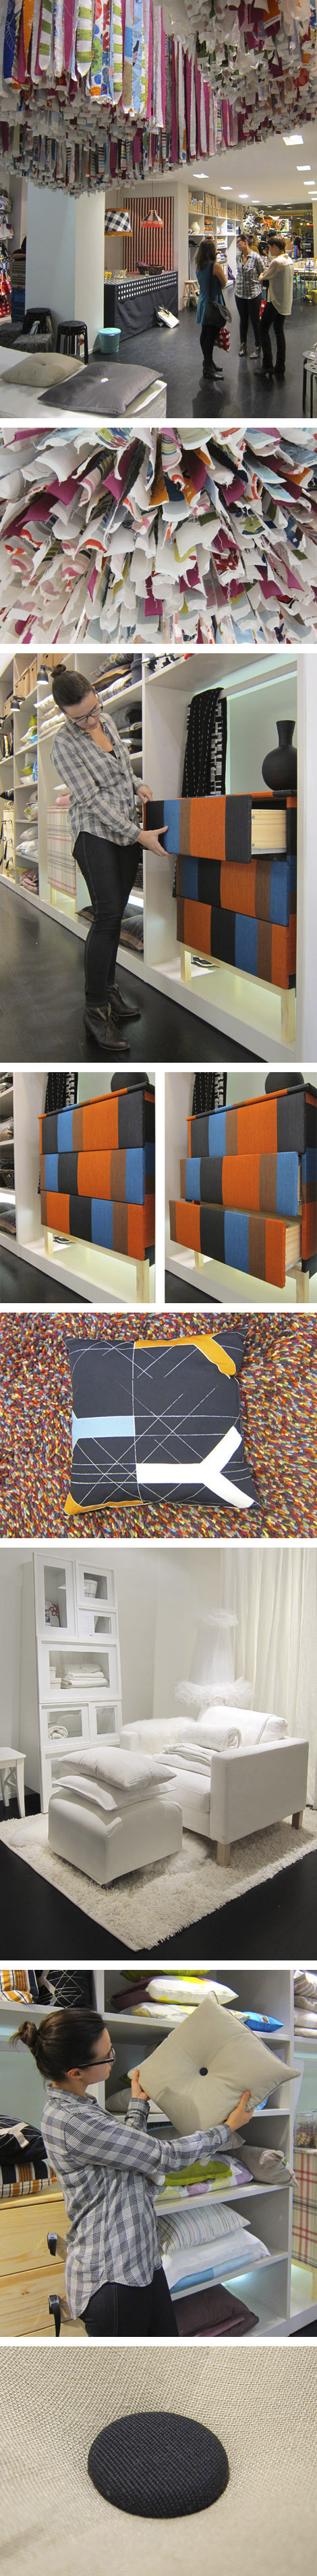 Ikea pop up textiles brussel